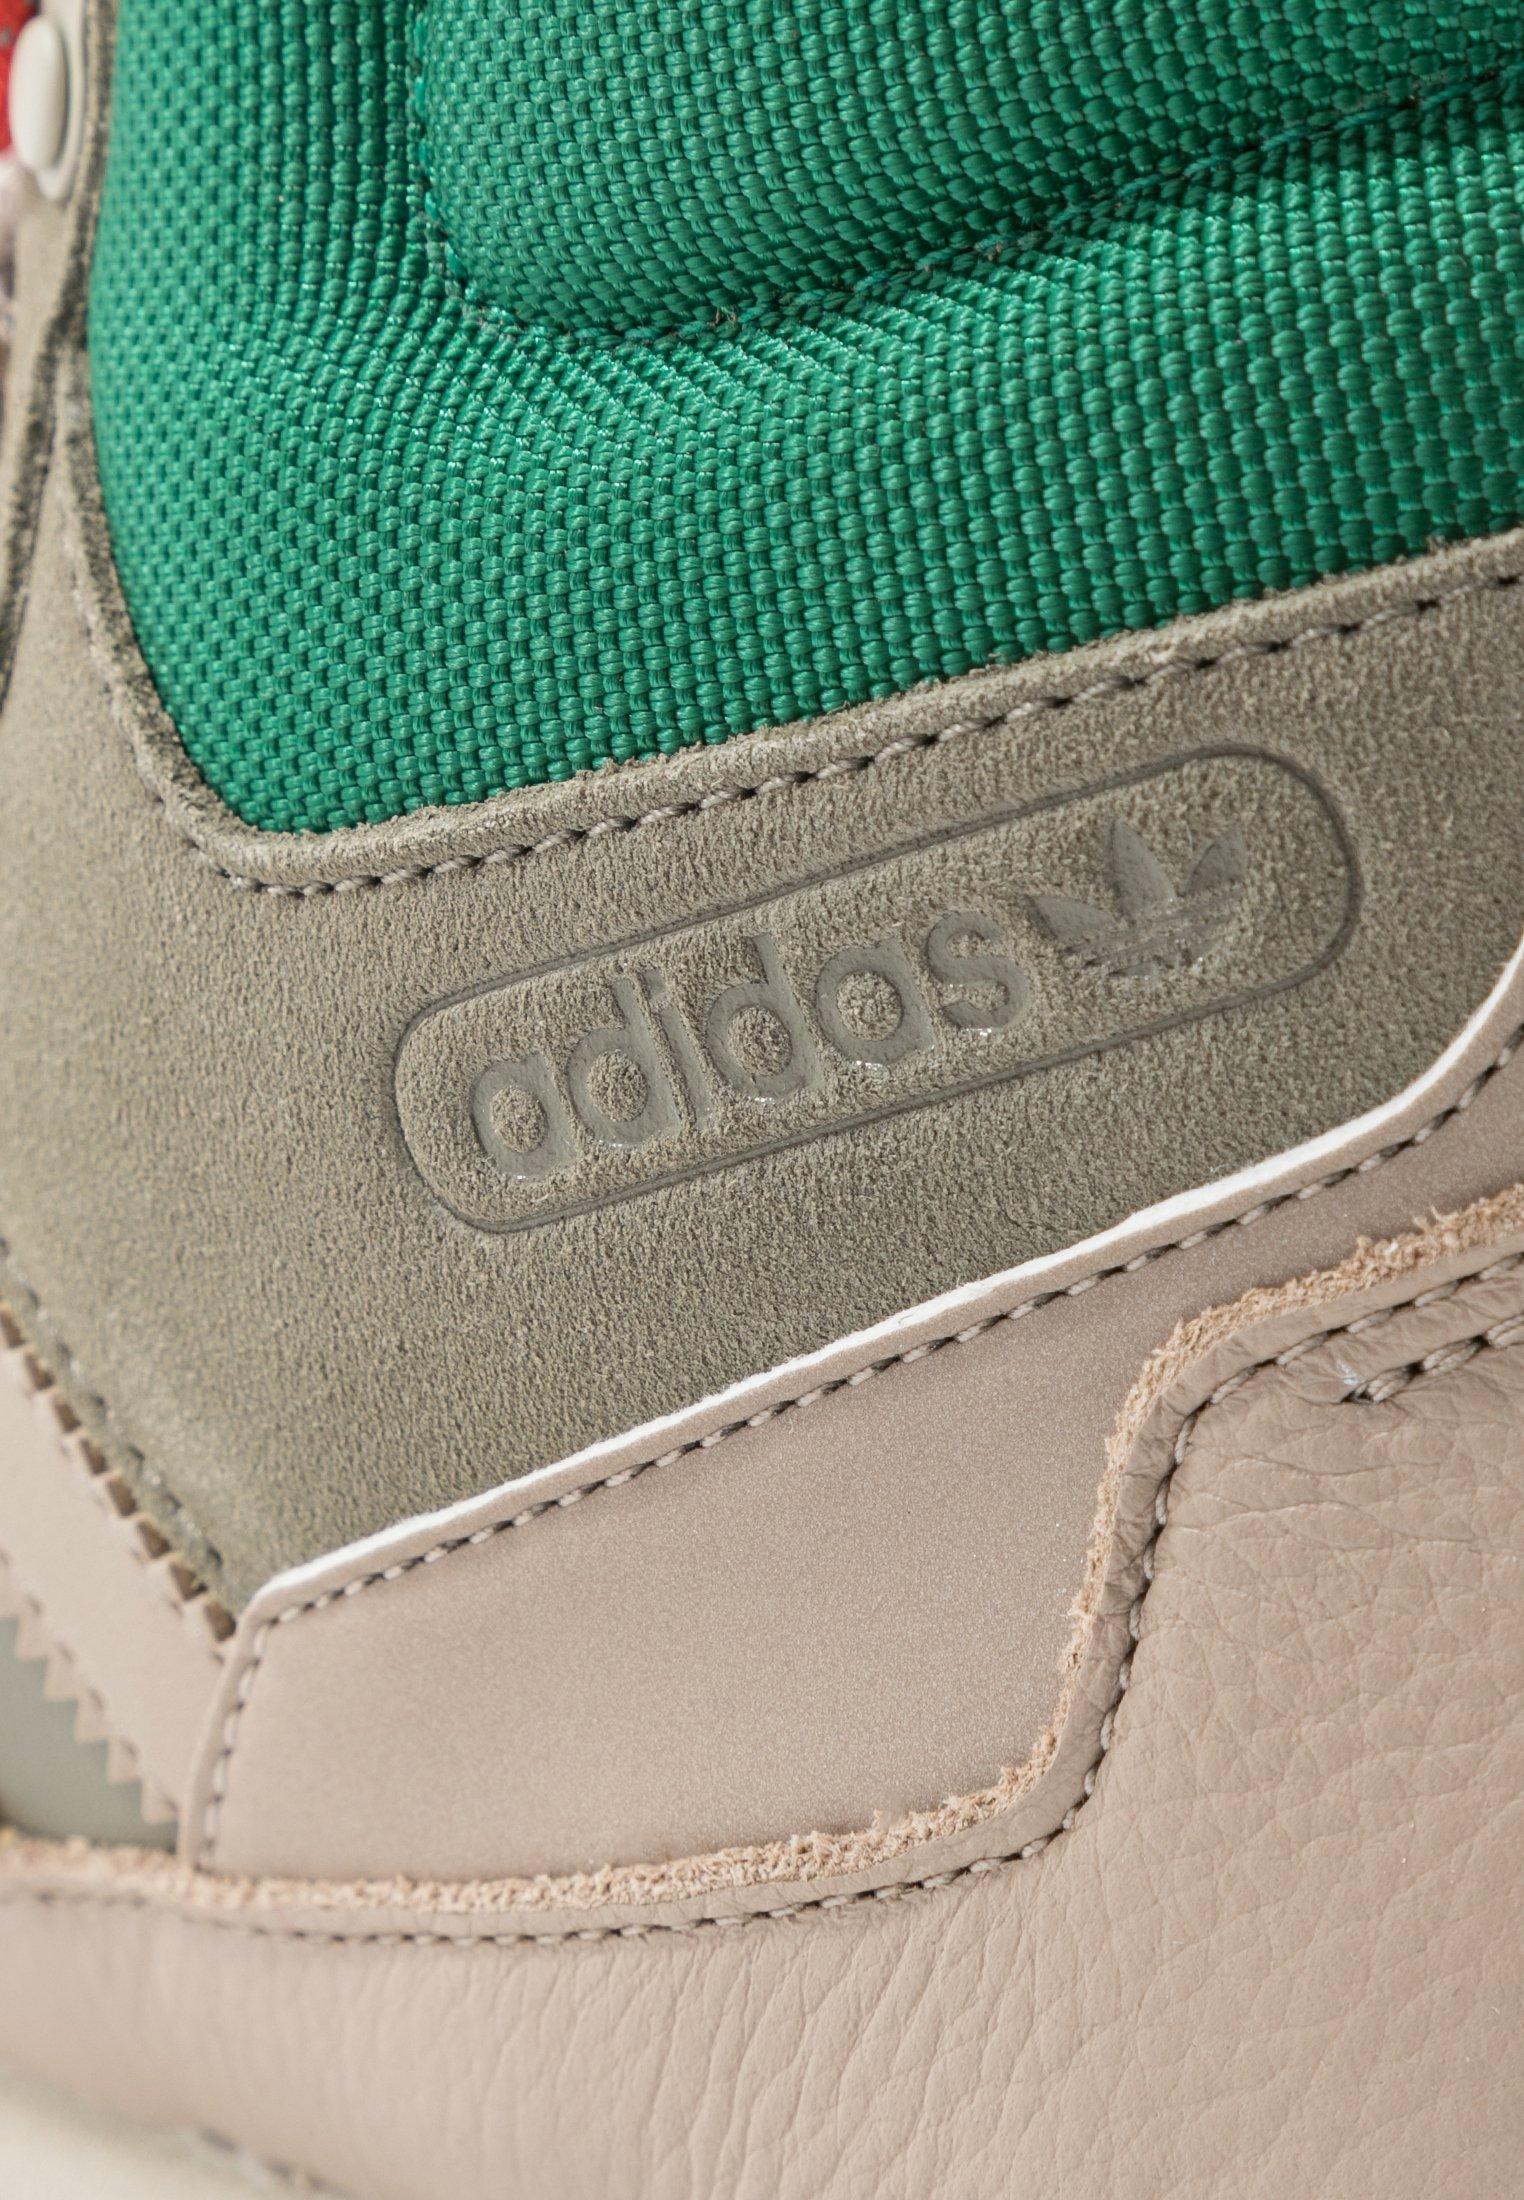 Adidas Originals Baara - Sneakers Hoog Trace Khaki/trace Carbon/core Black Goedkope Schoenen